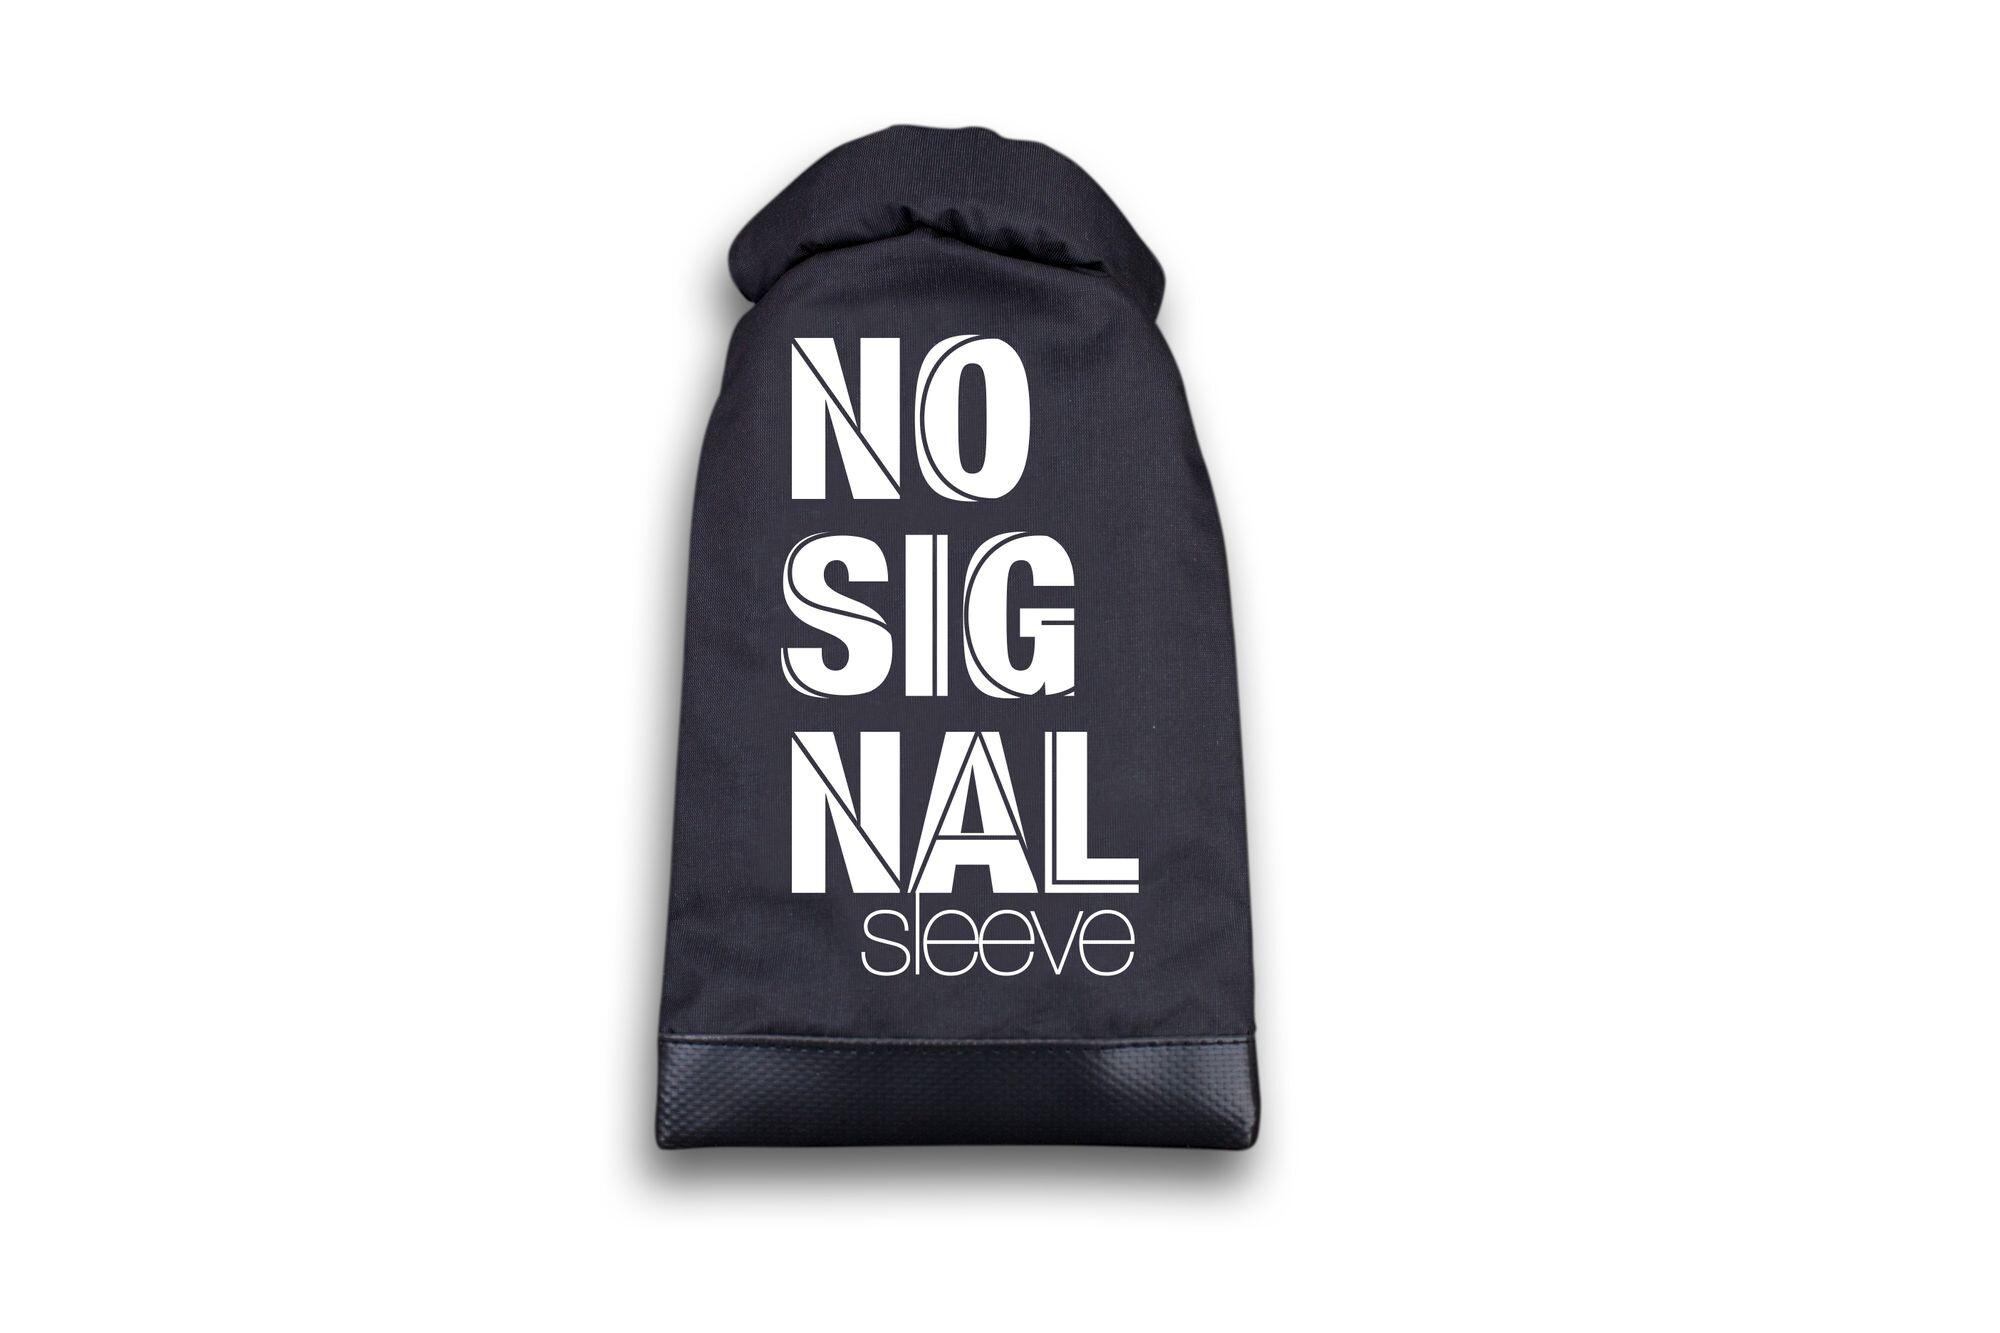 TOCA® NO SIGNAL sleeve